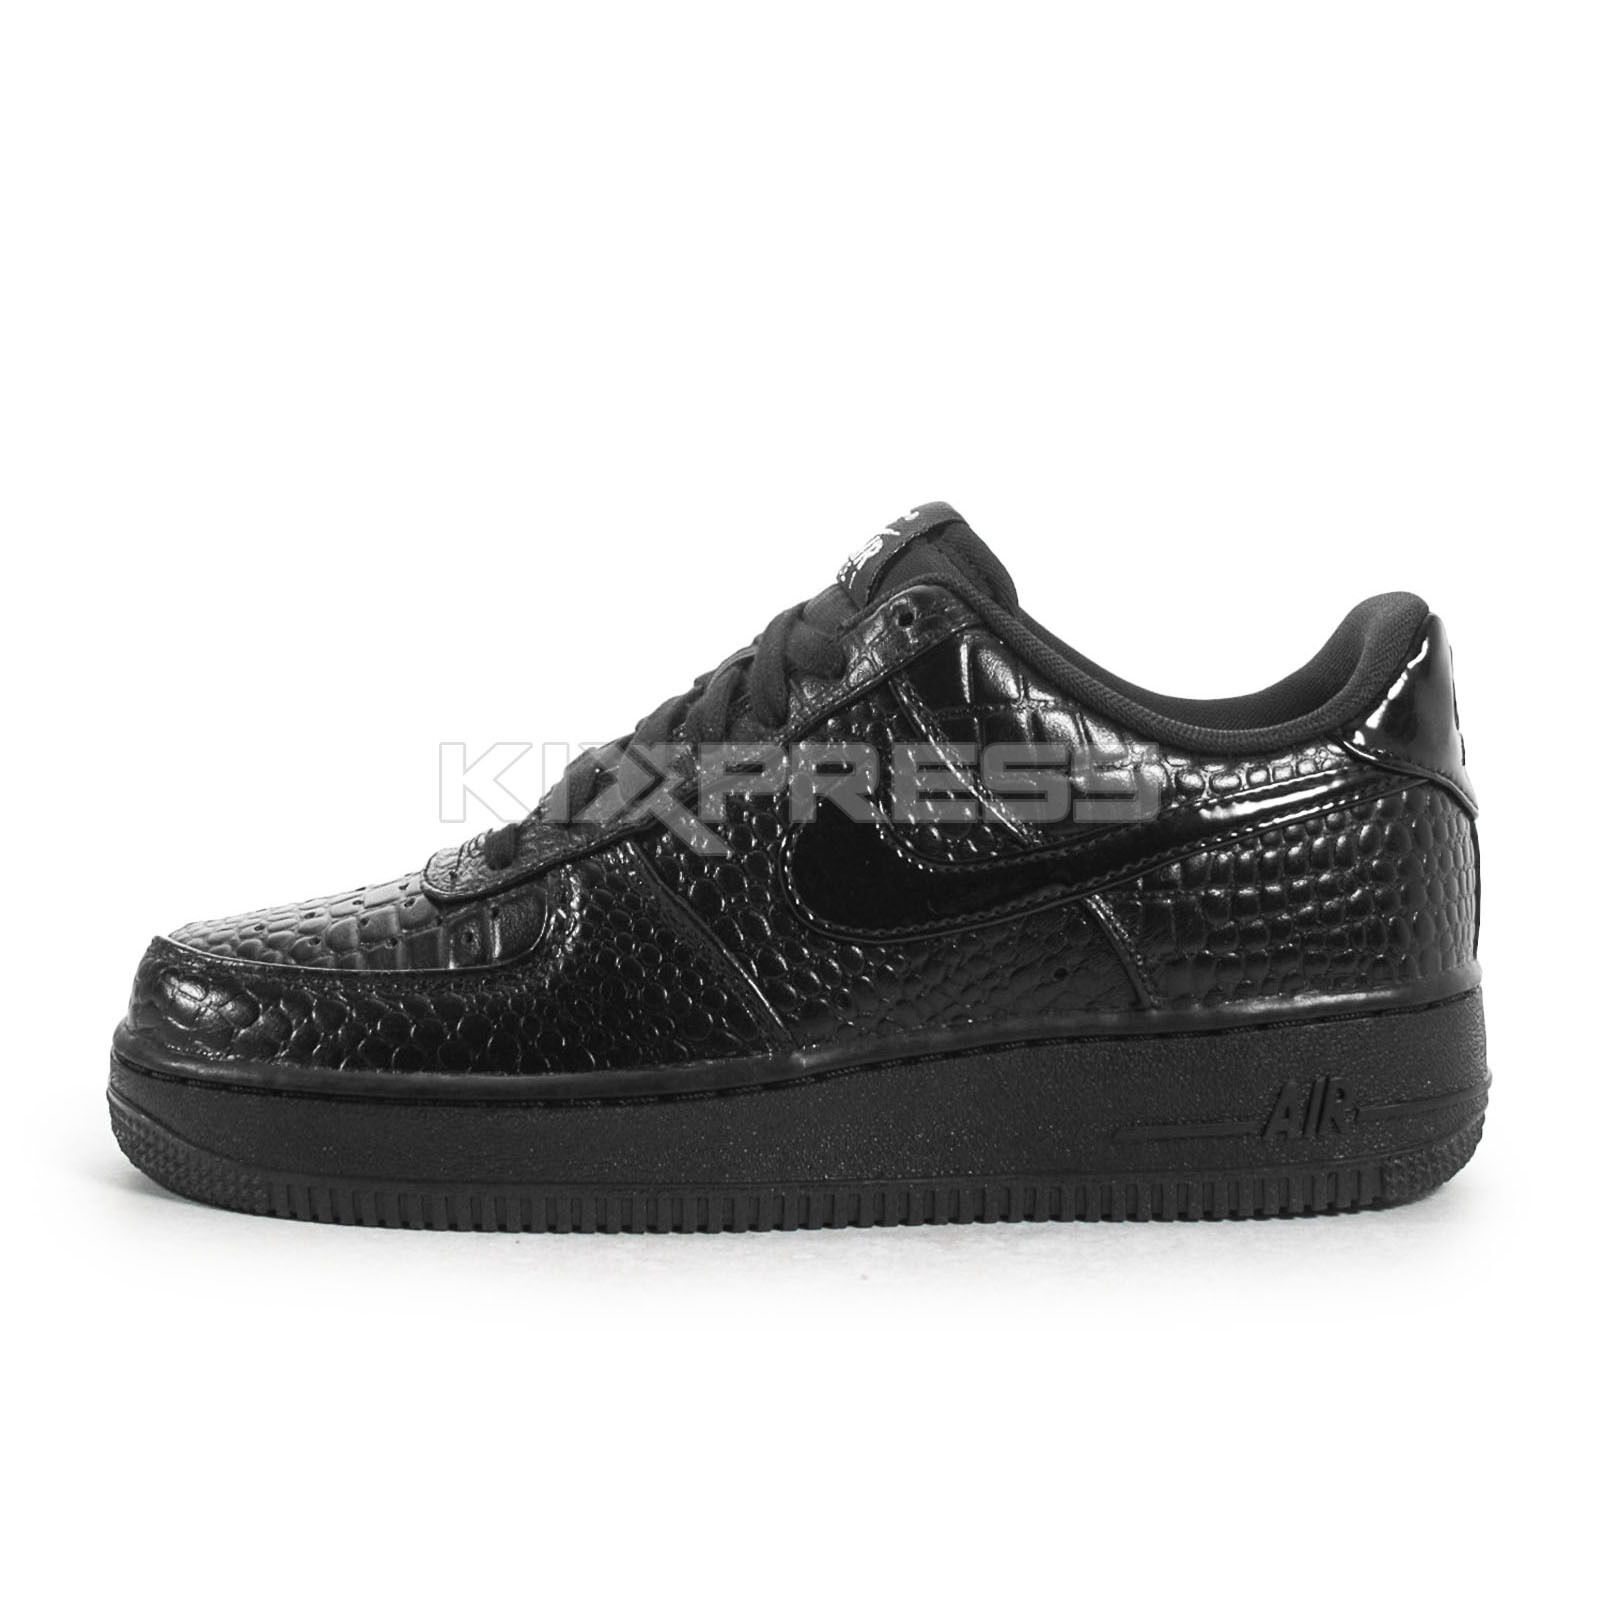 Nike WMNS Air Force 1 '07 PRM [616725-002] NSW Casual Crocs Black/Silver